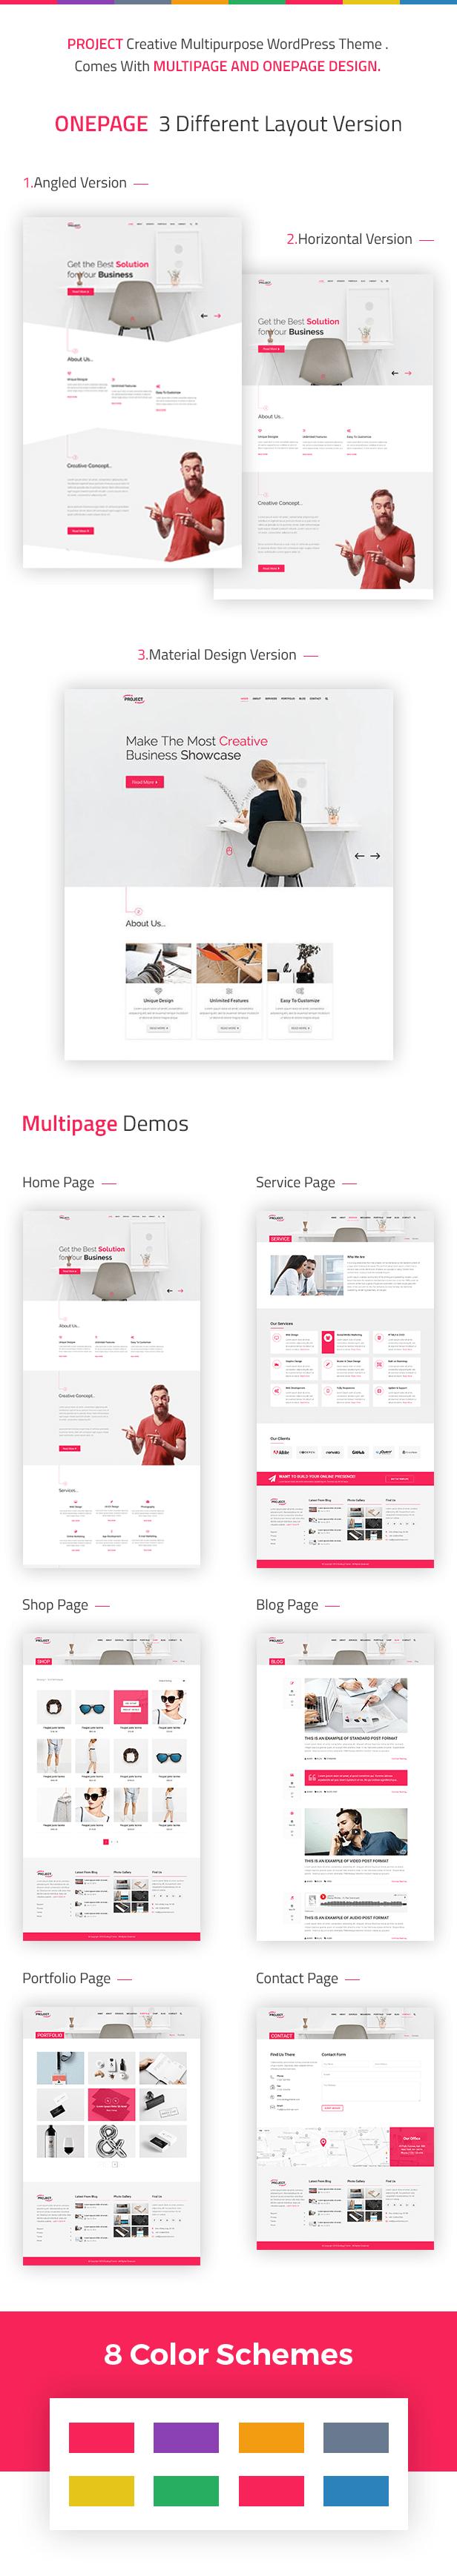 Project - Creative Multipurpose WordPress Theme Flexibility